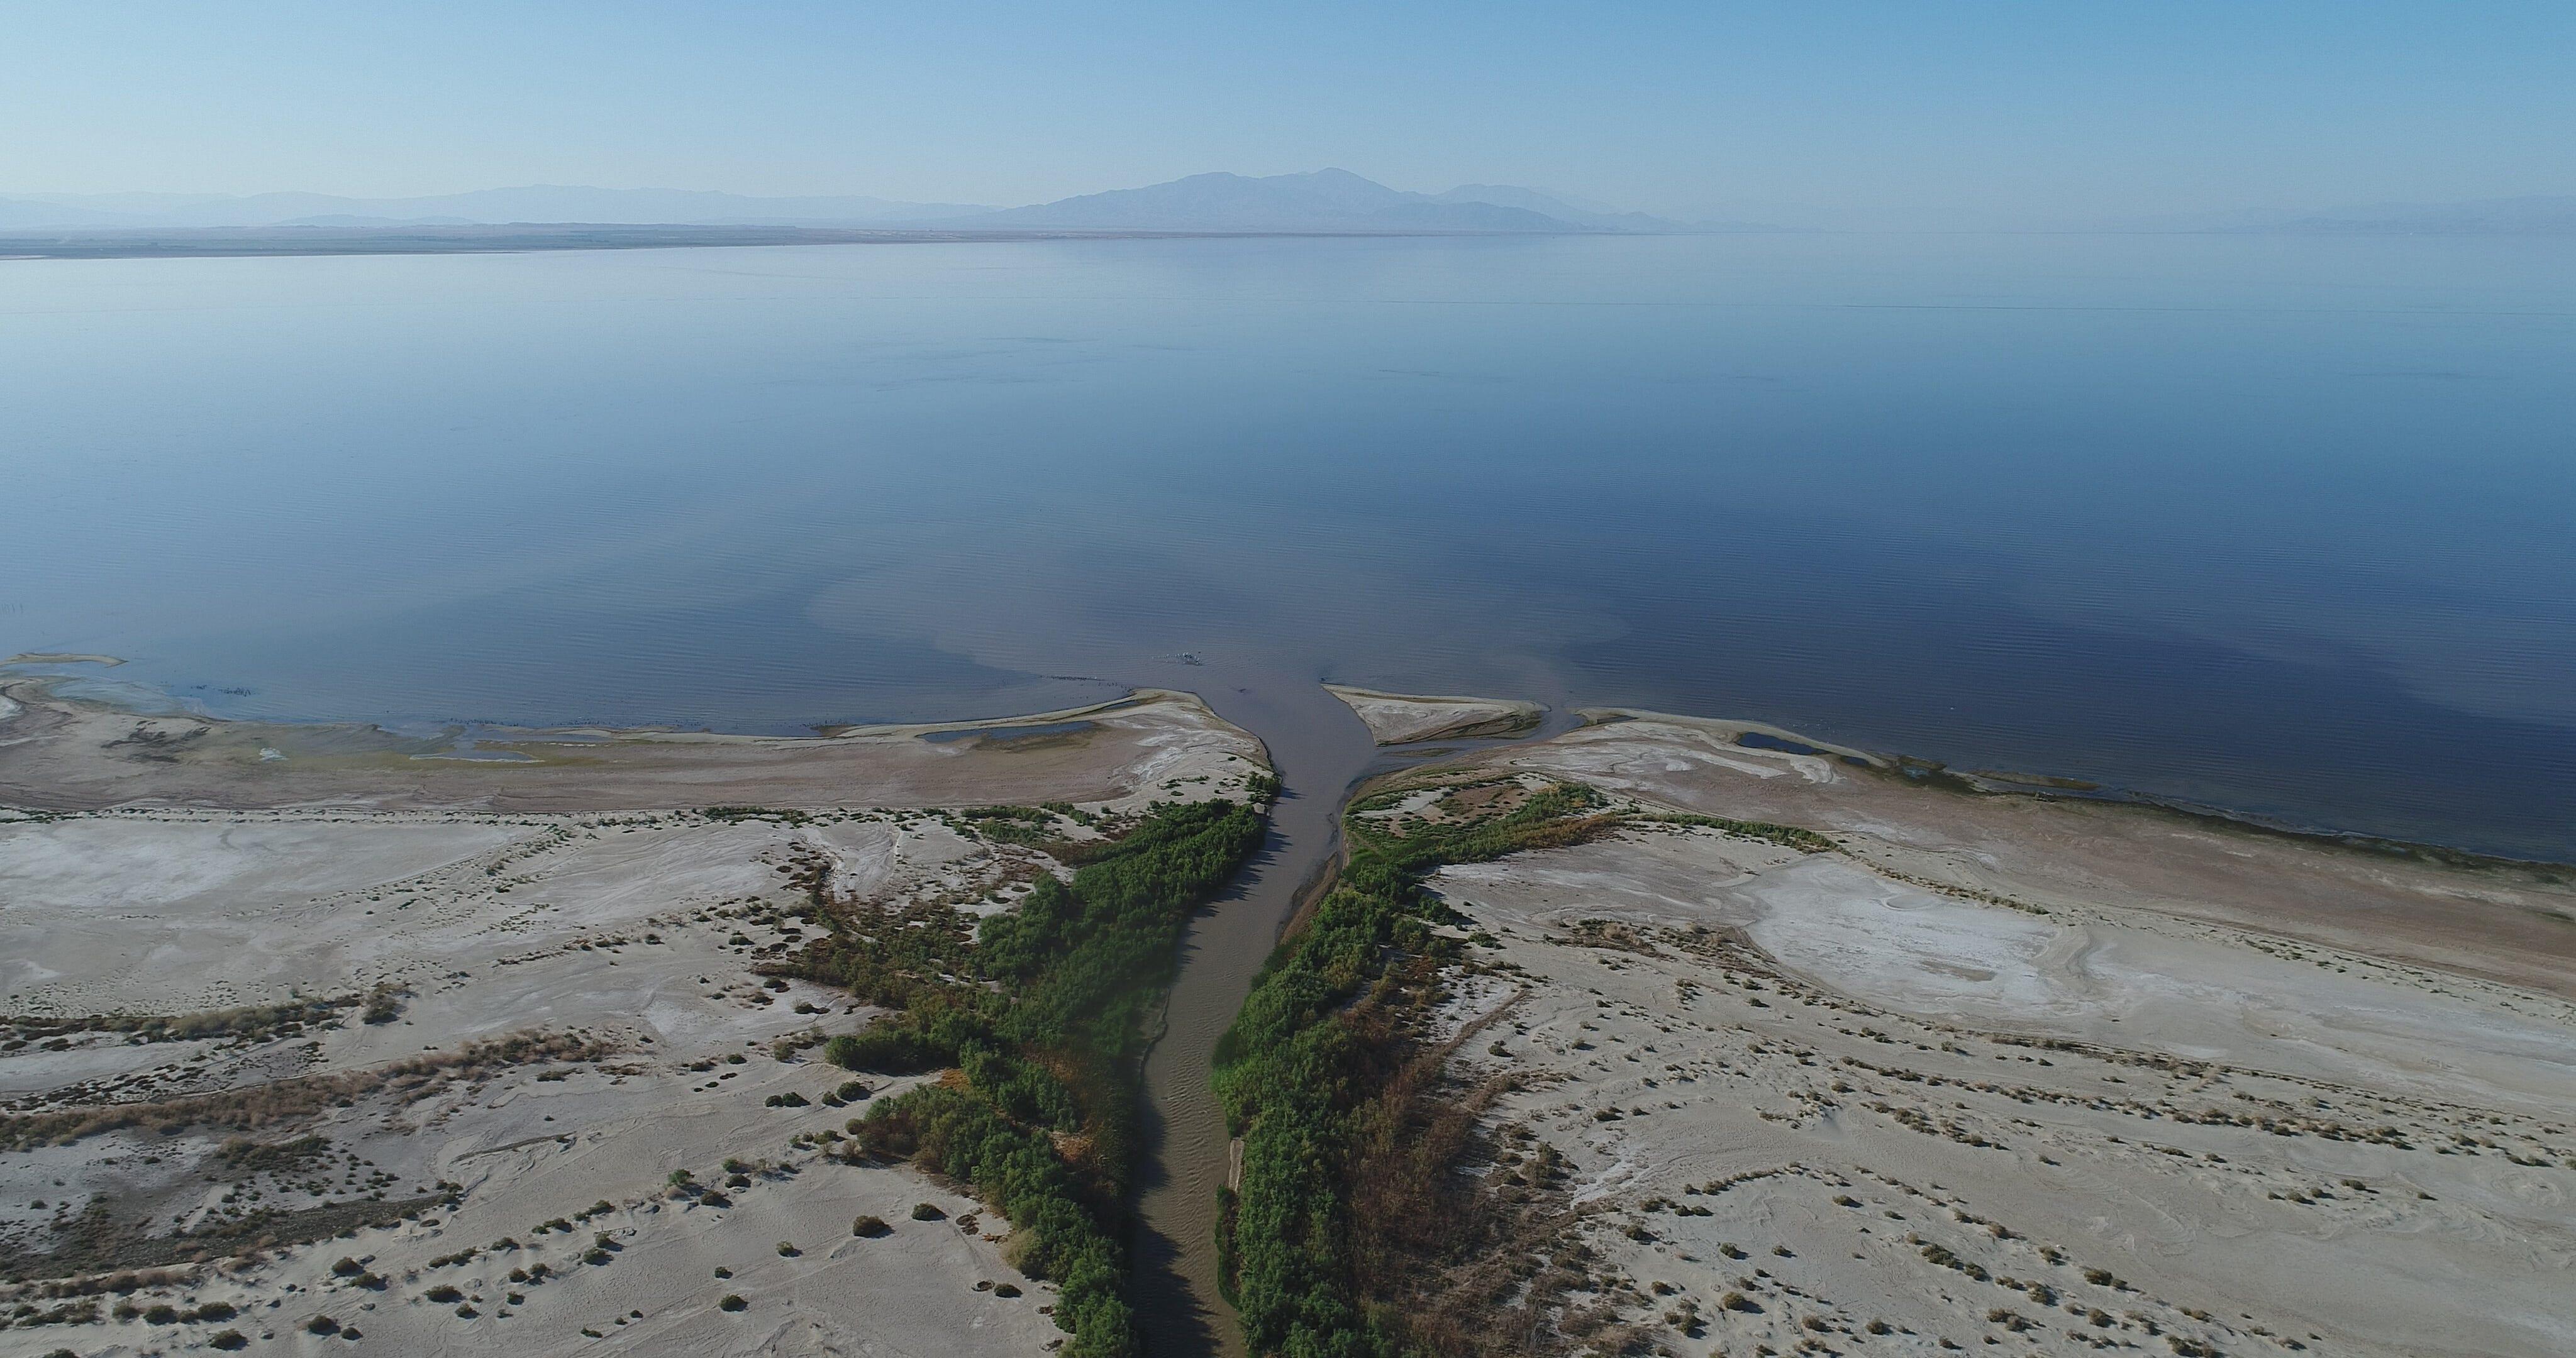 The New River flows into the Salton Sea.